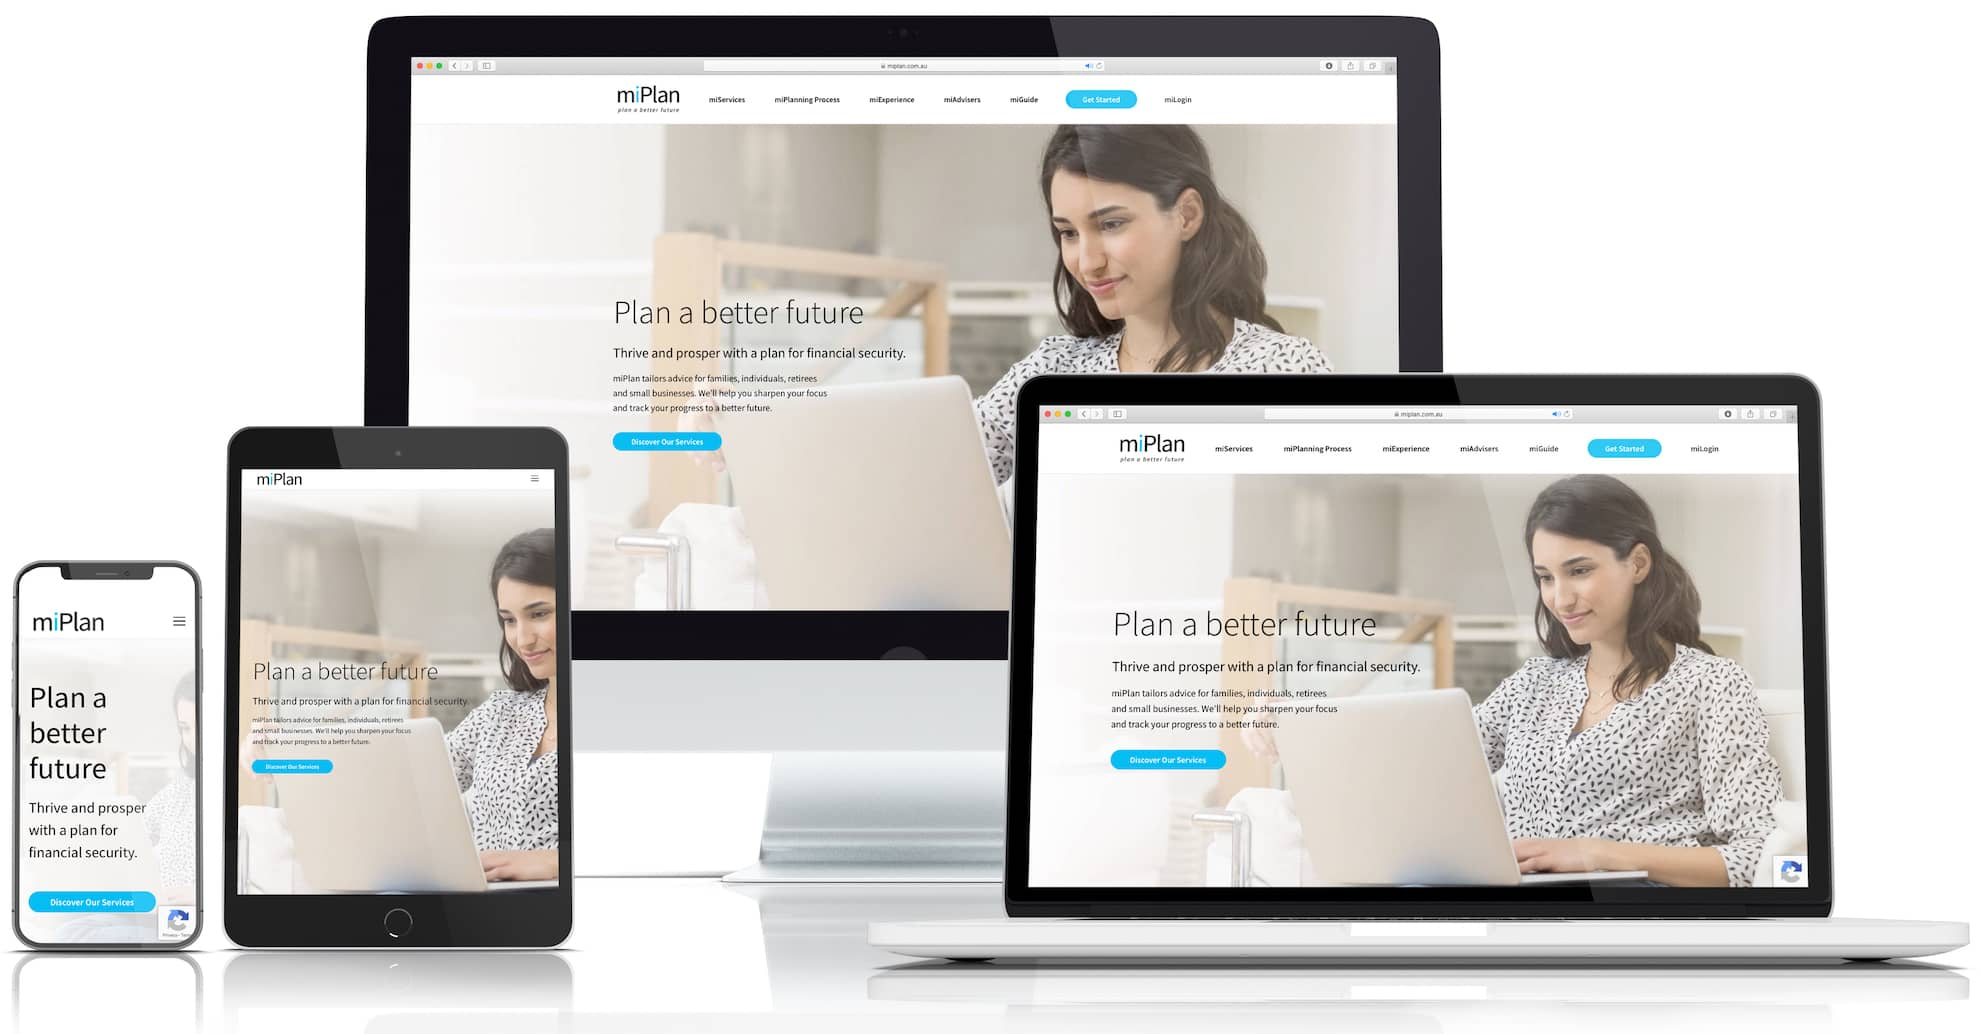 miPlan Website by Whitelam Media